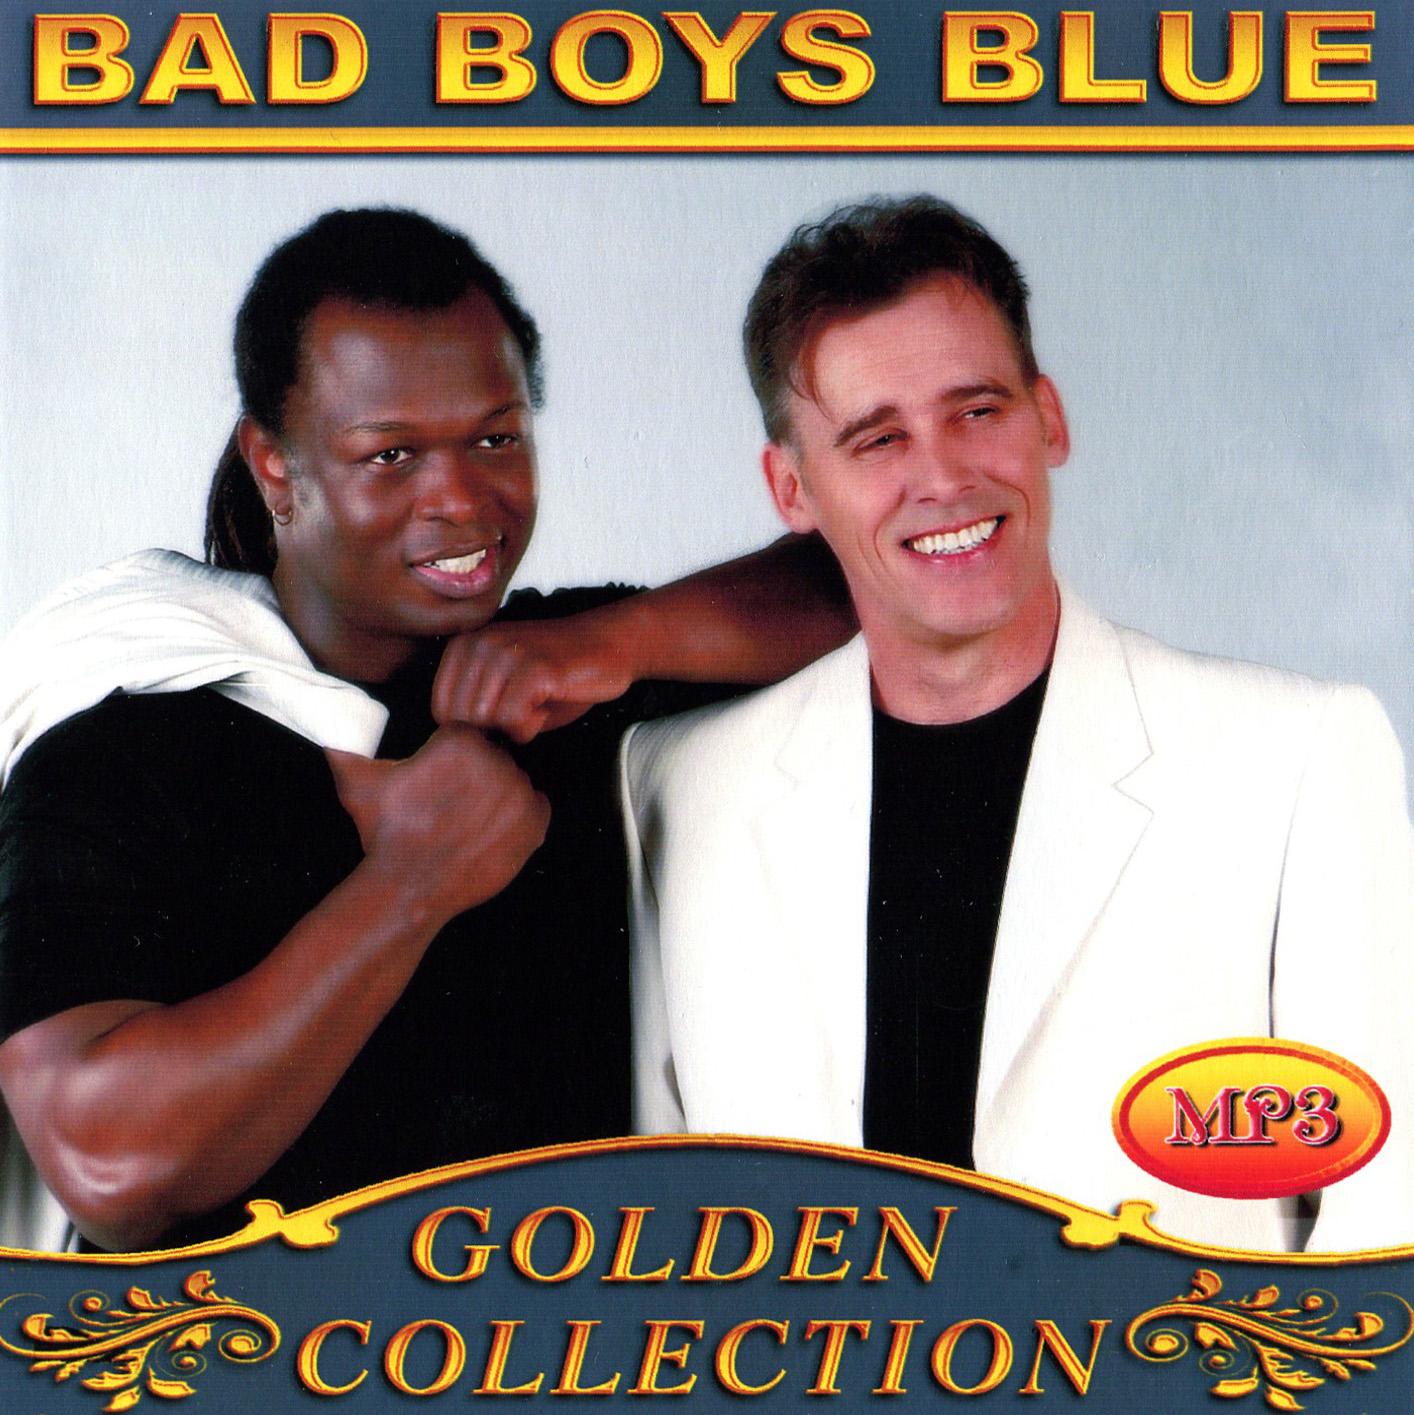 Bad Boys Blue [mp3]